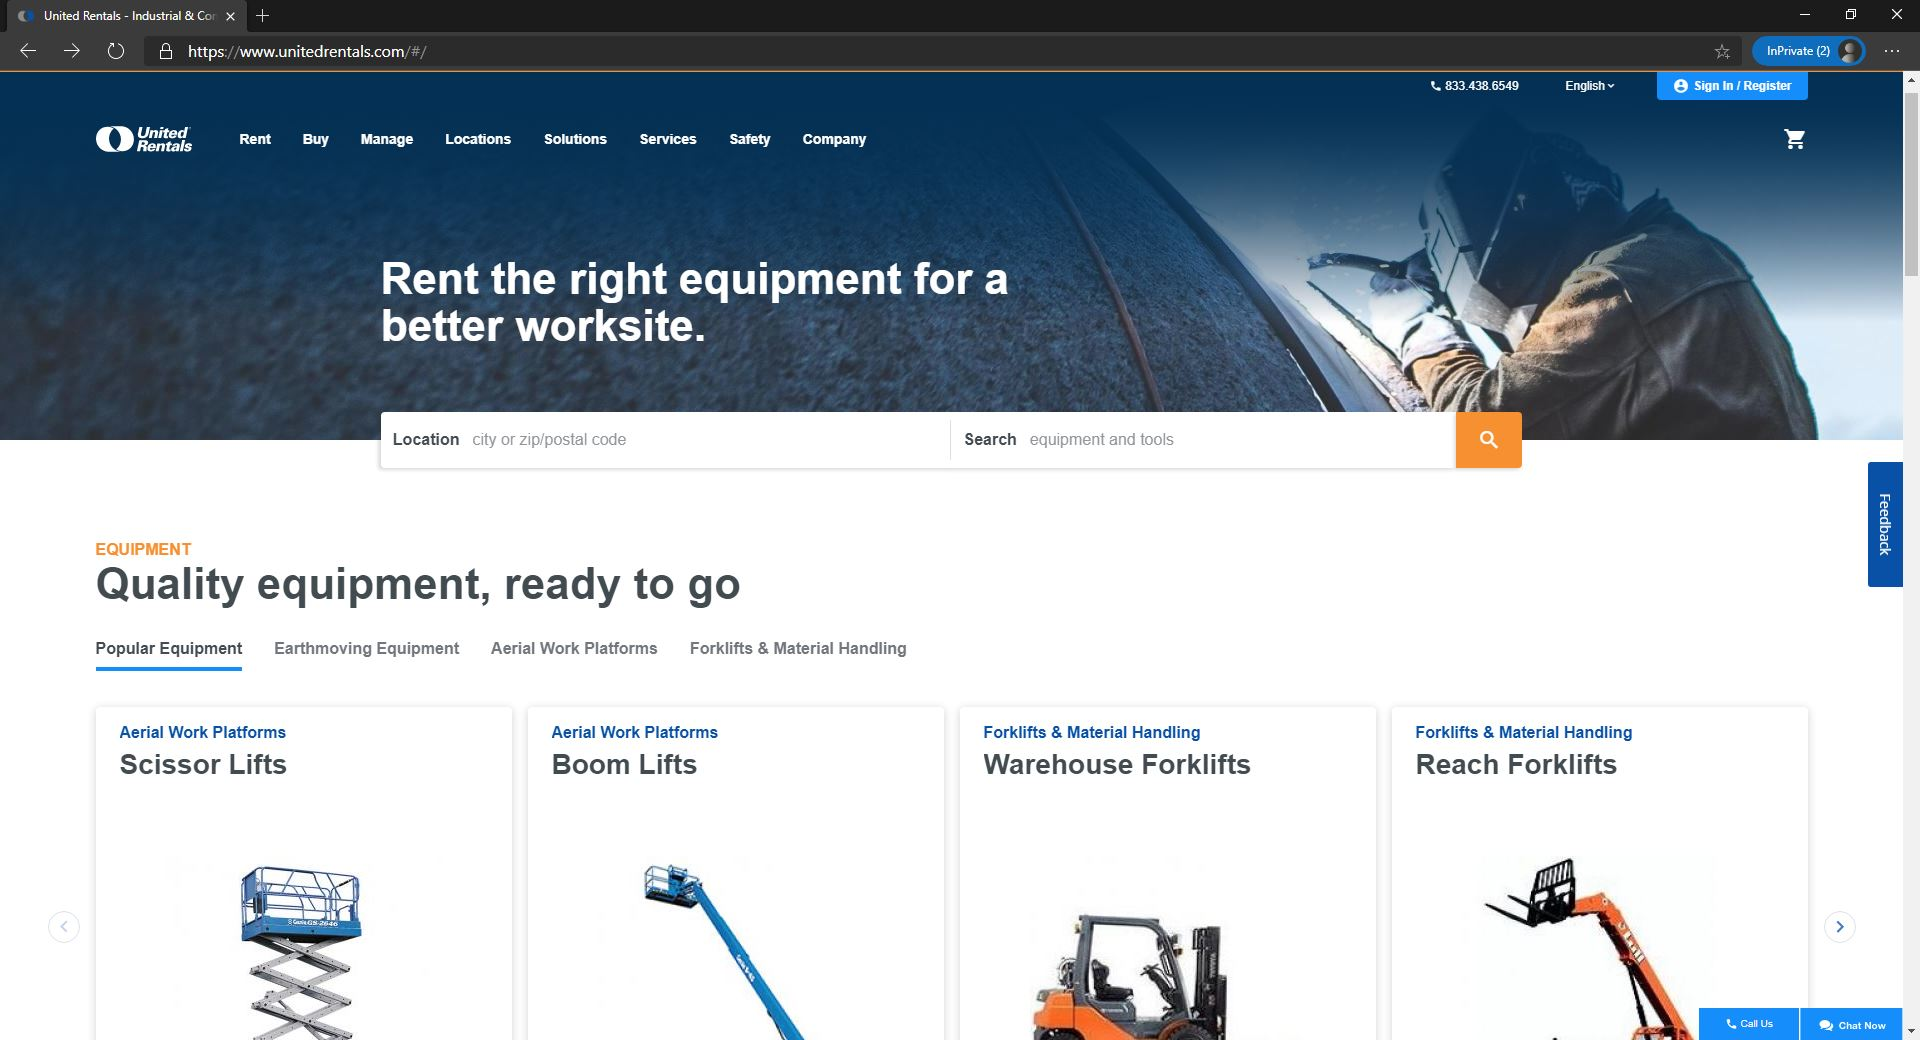 United Rentals website